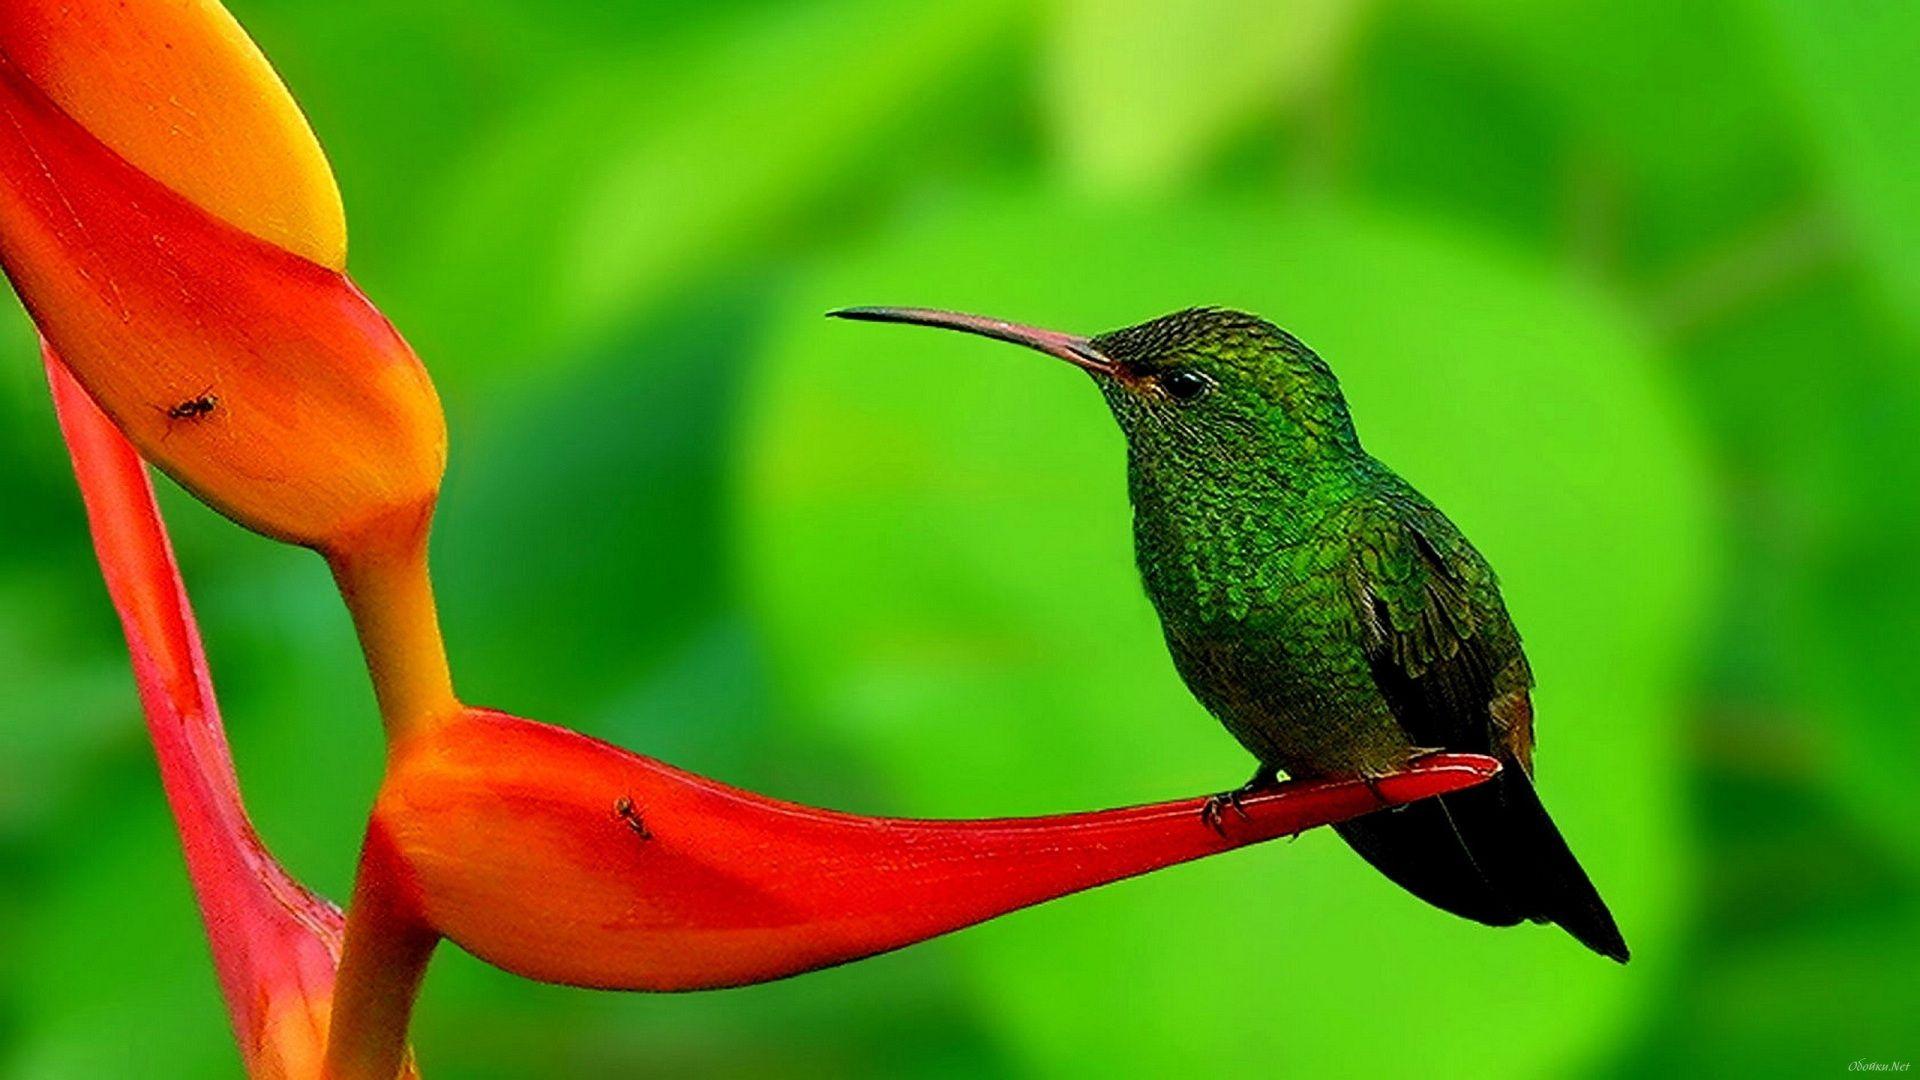 Humming bird hd wallpapers 1080p birds most beautiful - Most popular hd wallpapers 1080p ...